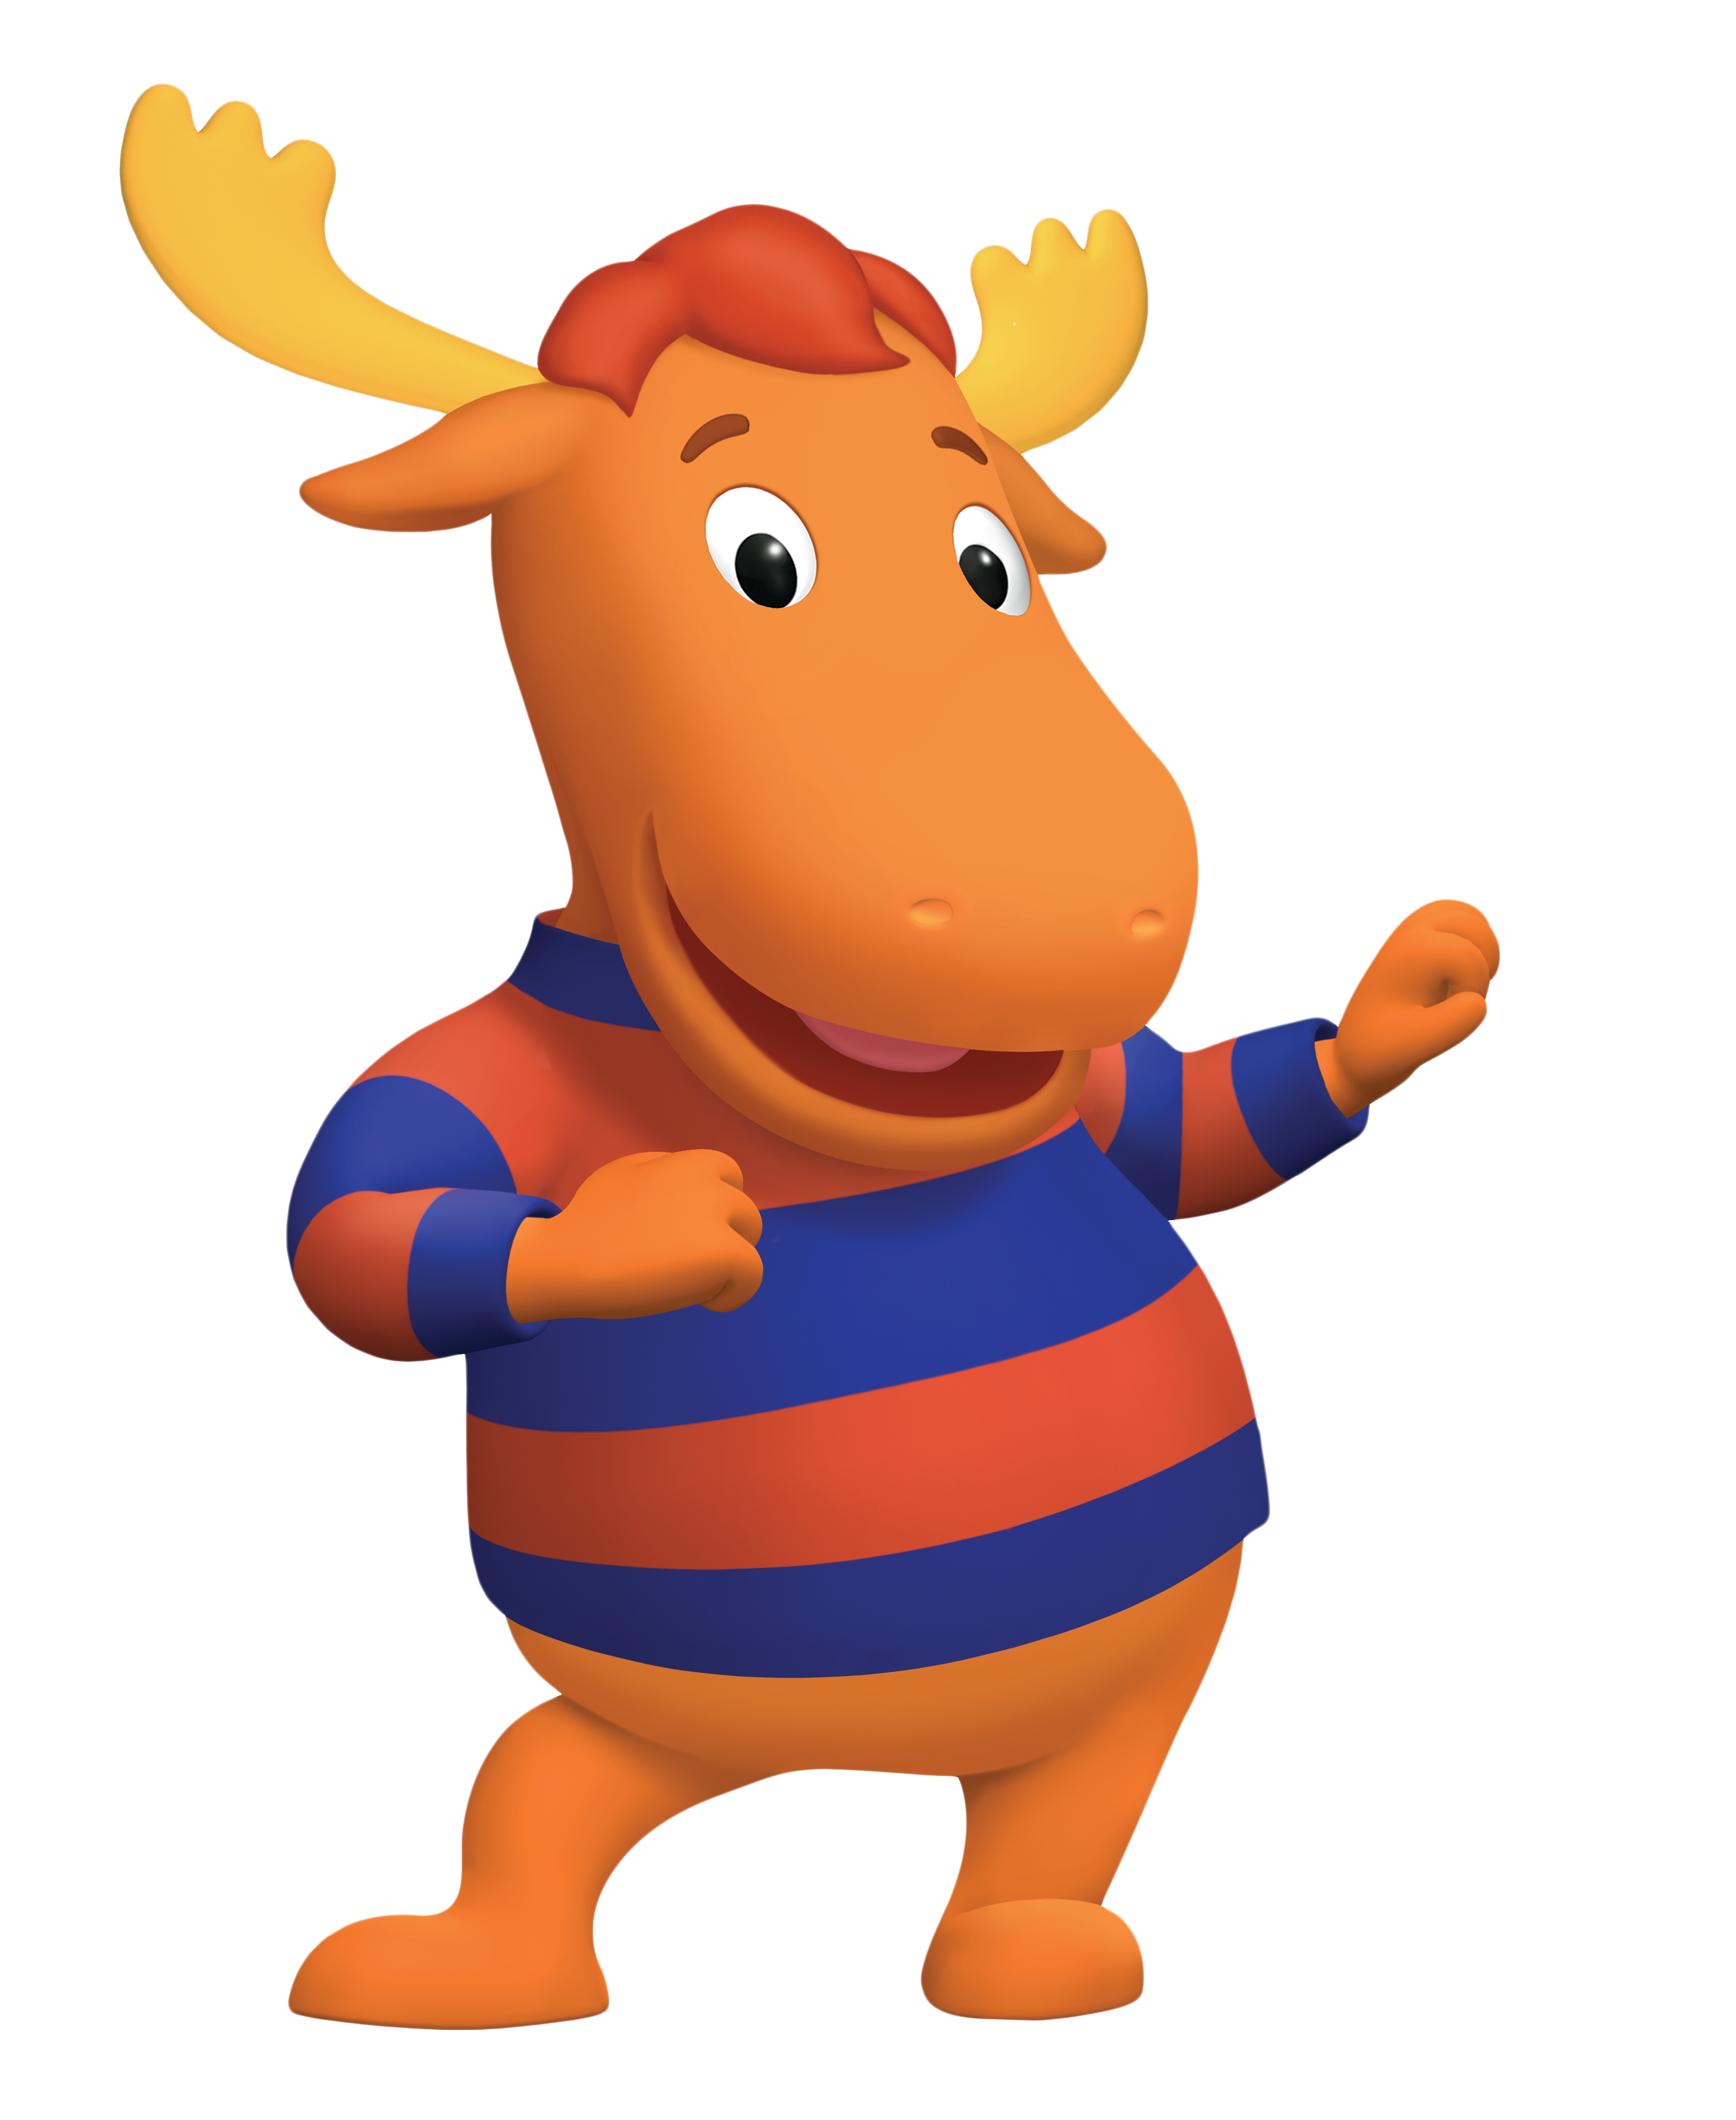 Moose clipart girl moose. Tyrone the backyardigans wiki